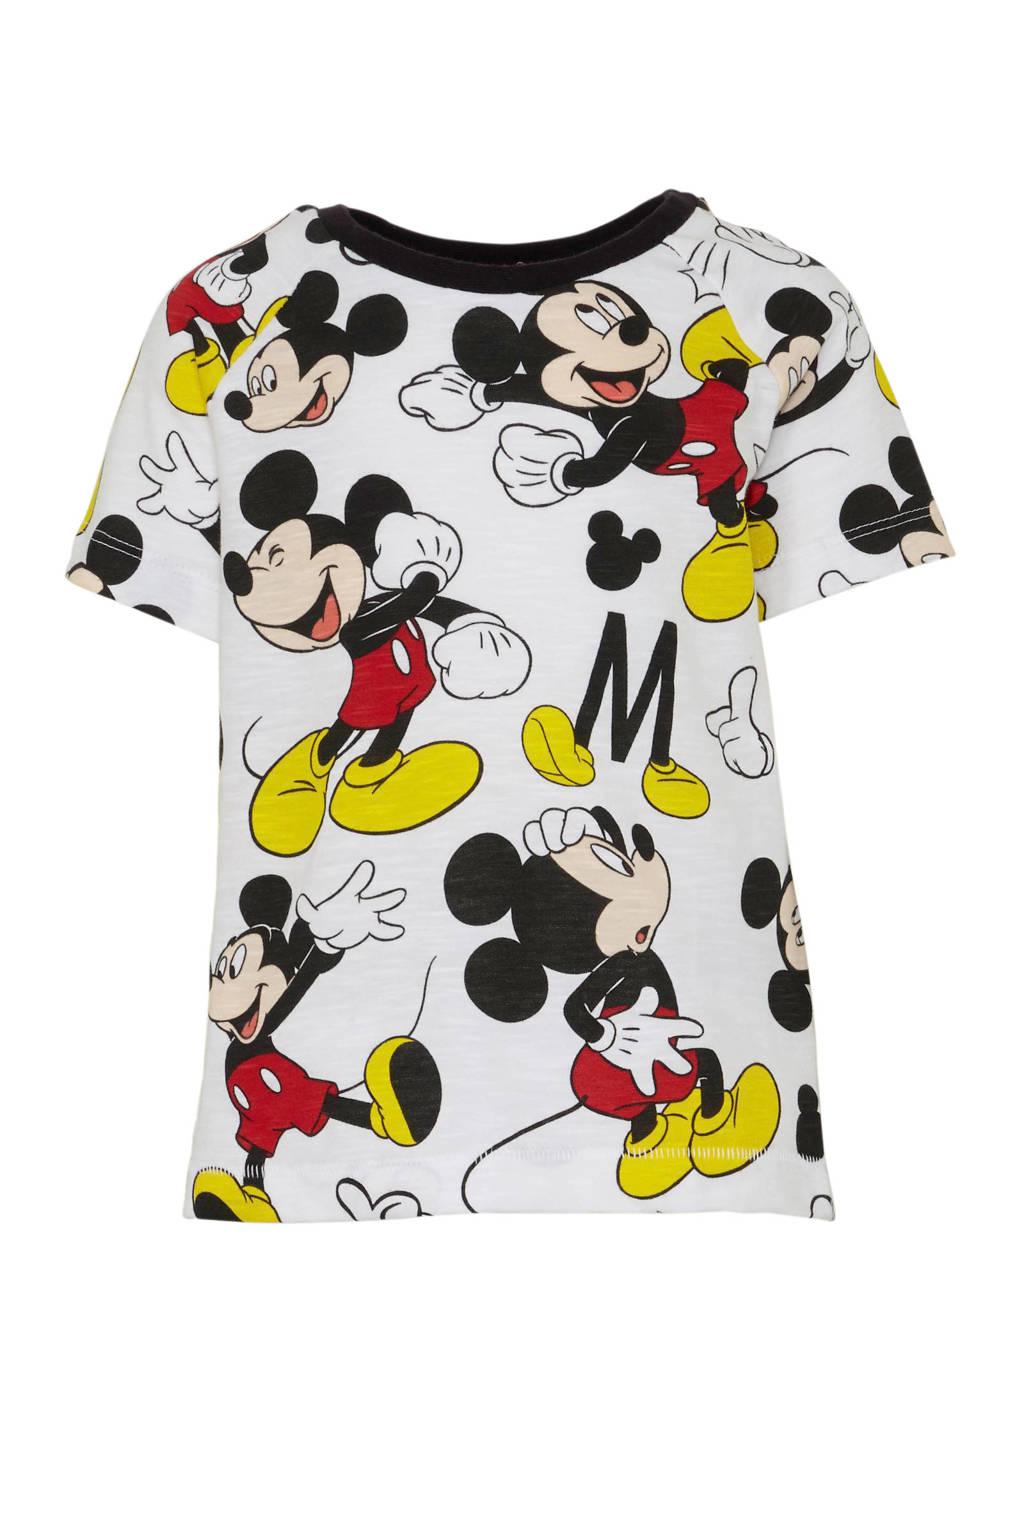 Disney @ C&A Mickey Mouse T-shirt met all over print wit/zwart/rood/geel, Wit/zwart/rood/geel